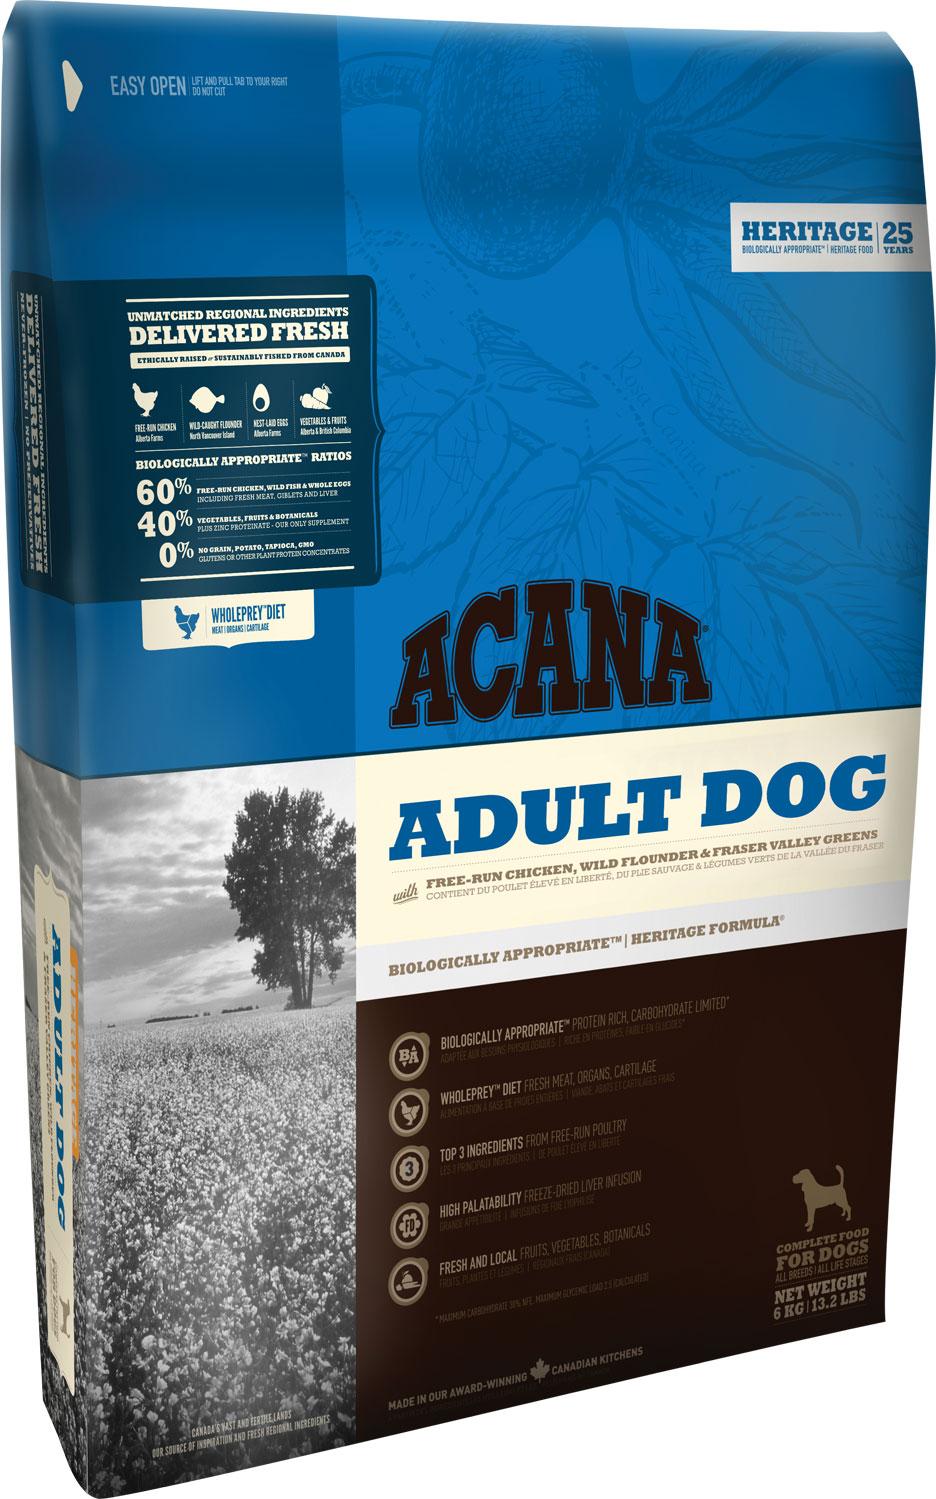 ACANA Adult Dog 17 kg.